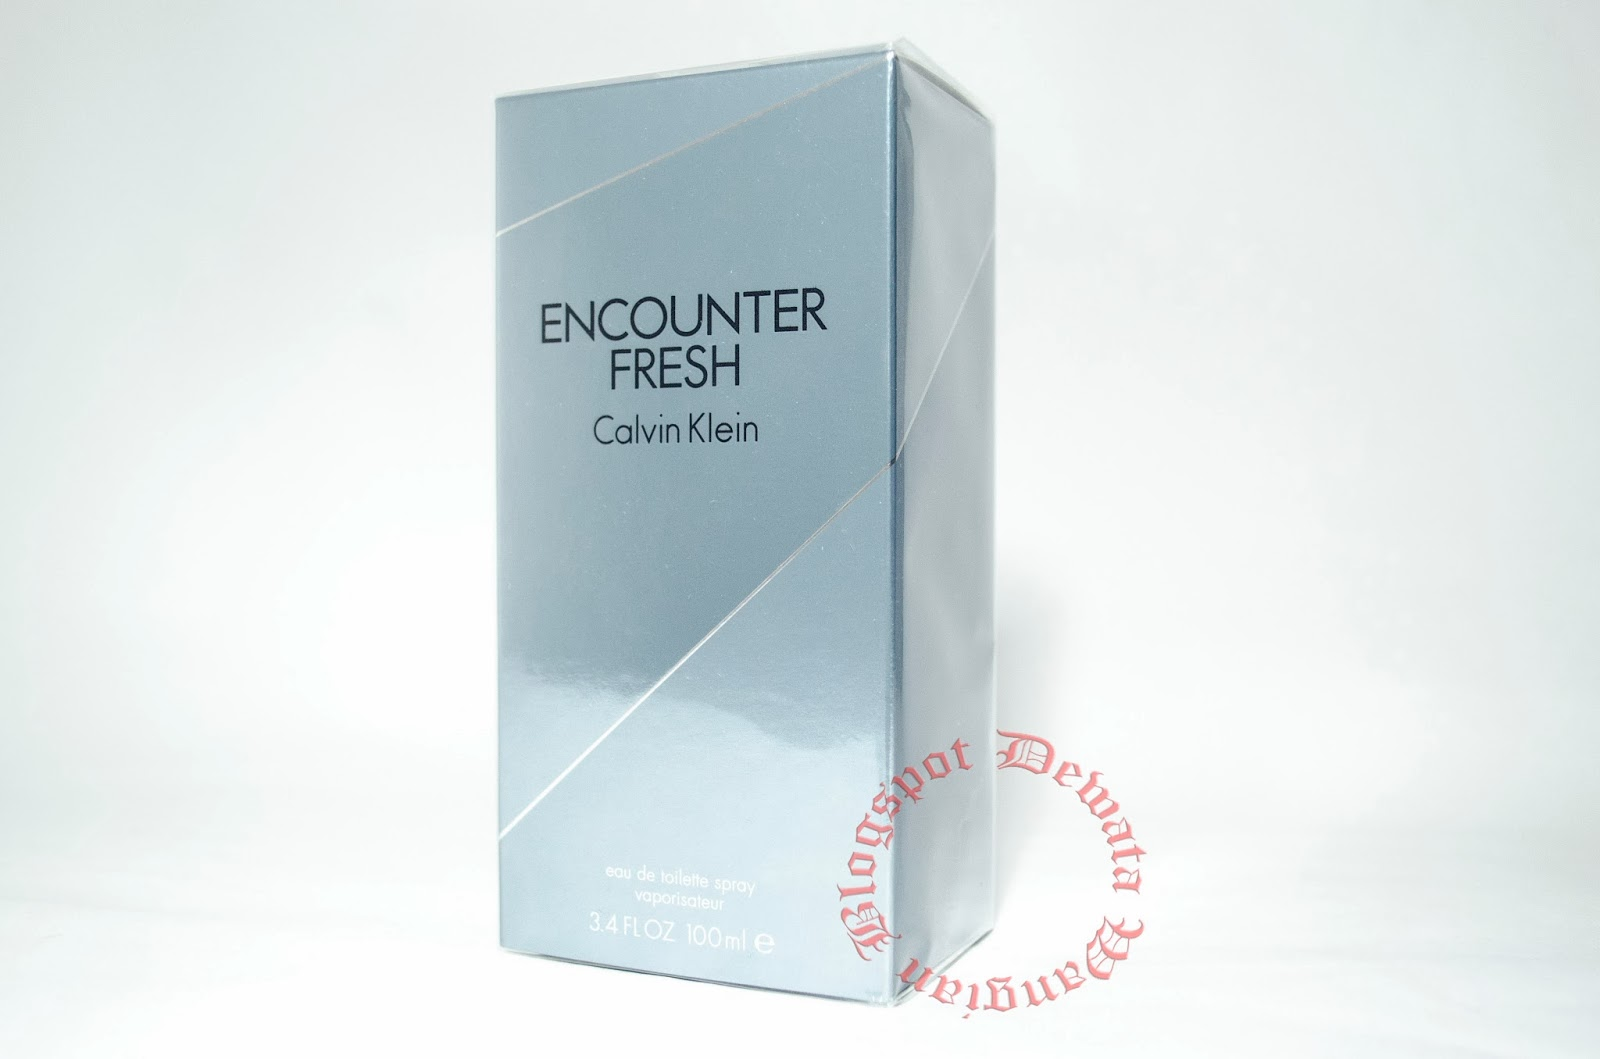 New & Boxed Carefully Selected Materials Lacoste Essential Eau De Toilette Pour Homme 125 Ml Aftershave & Pre-shave Health & Beauty